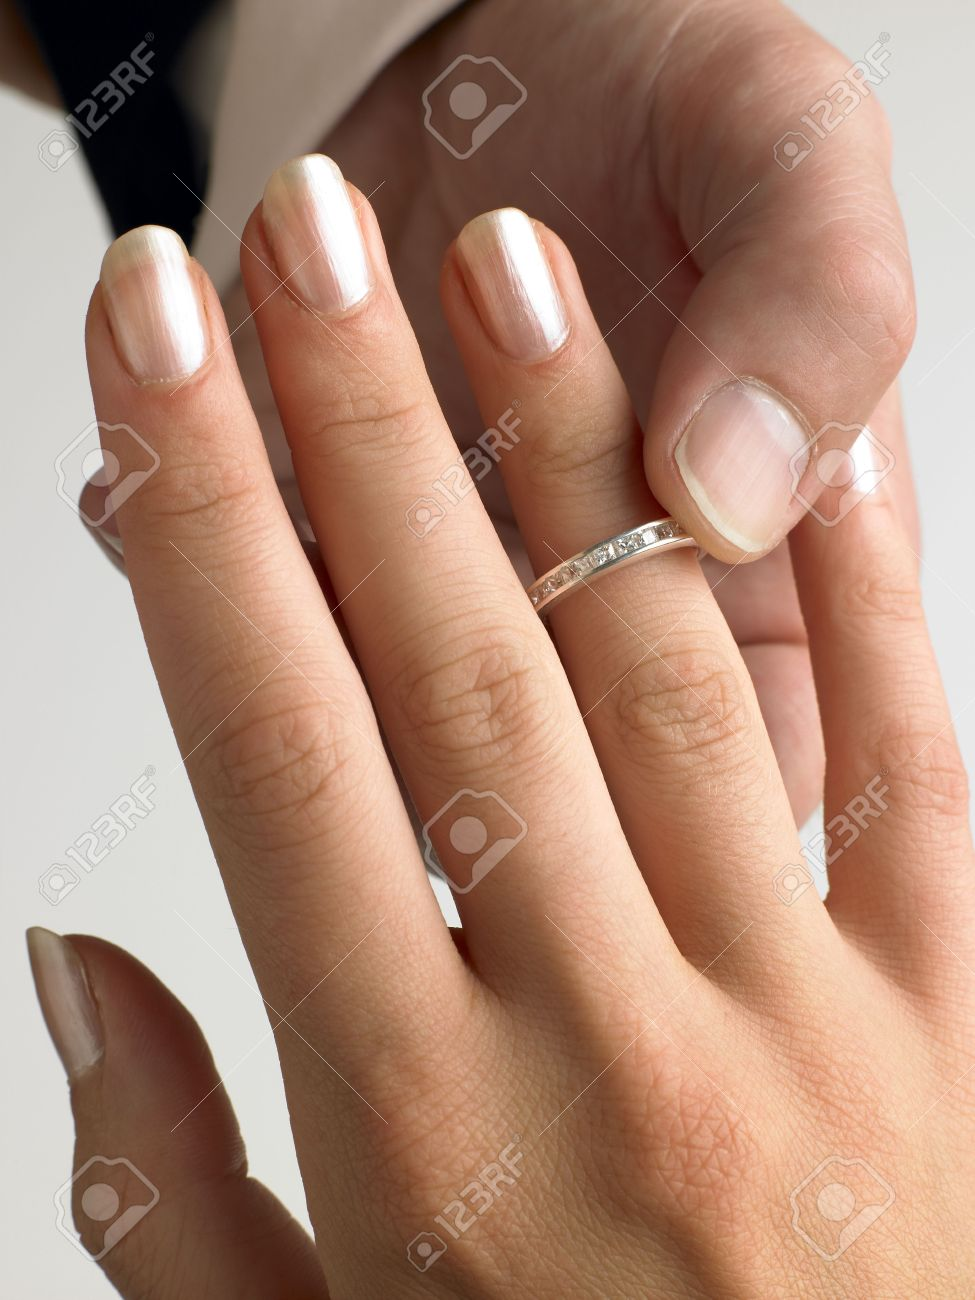 Man Putting Diamond Ring On Woman's Finger Stock Photo - 4638931